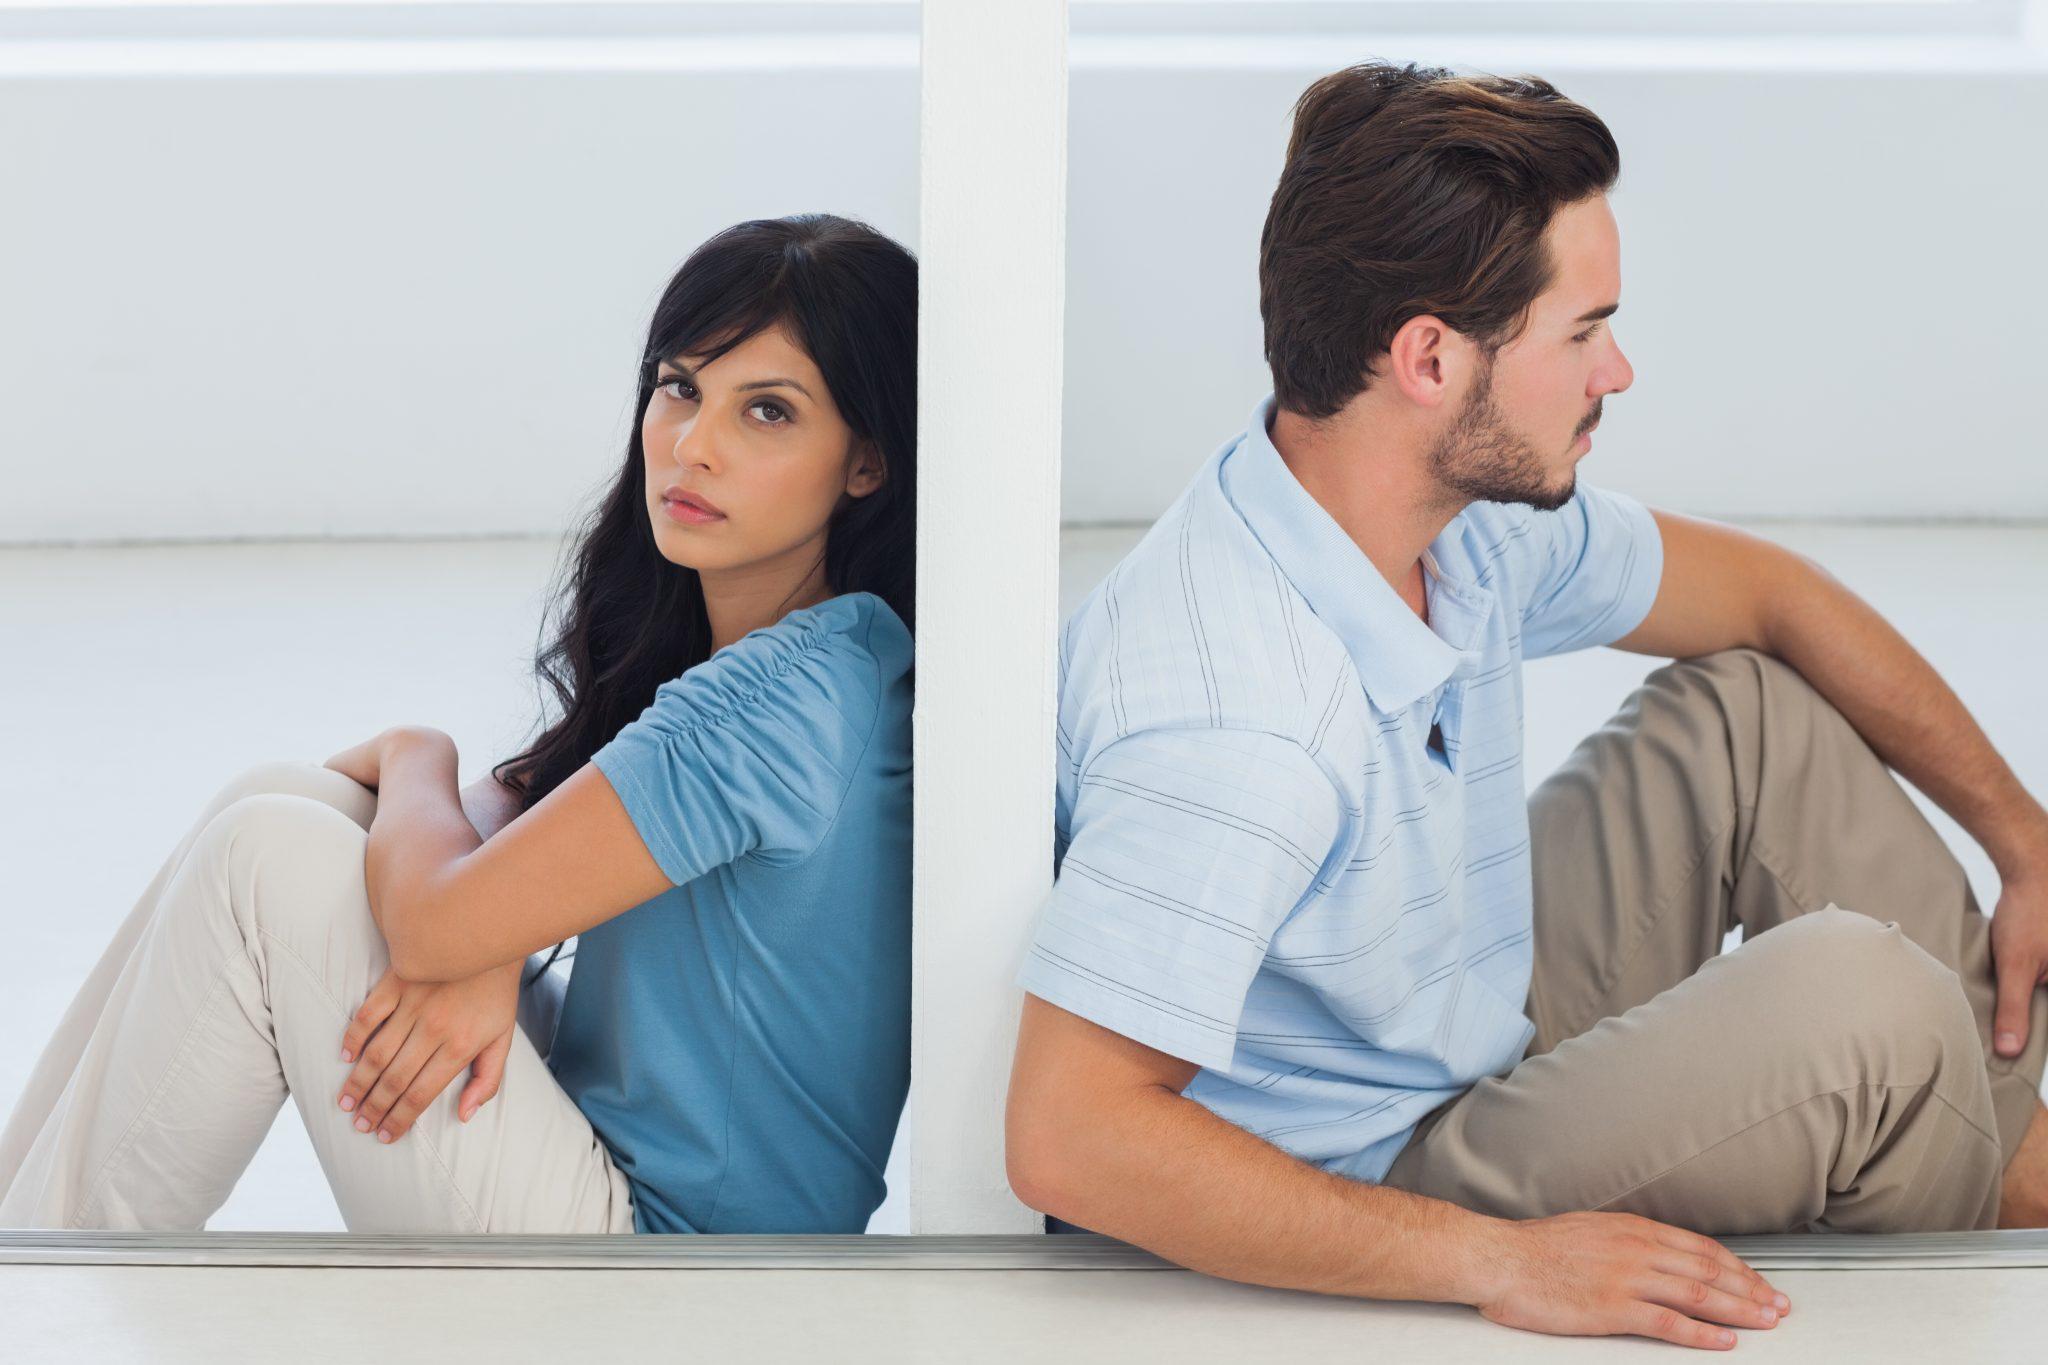 Intimate relationships closure myth